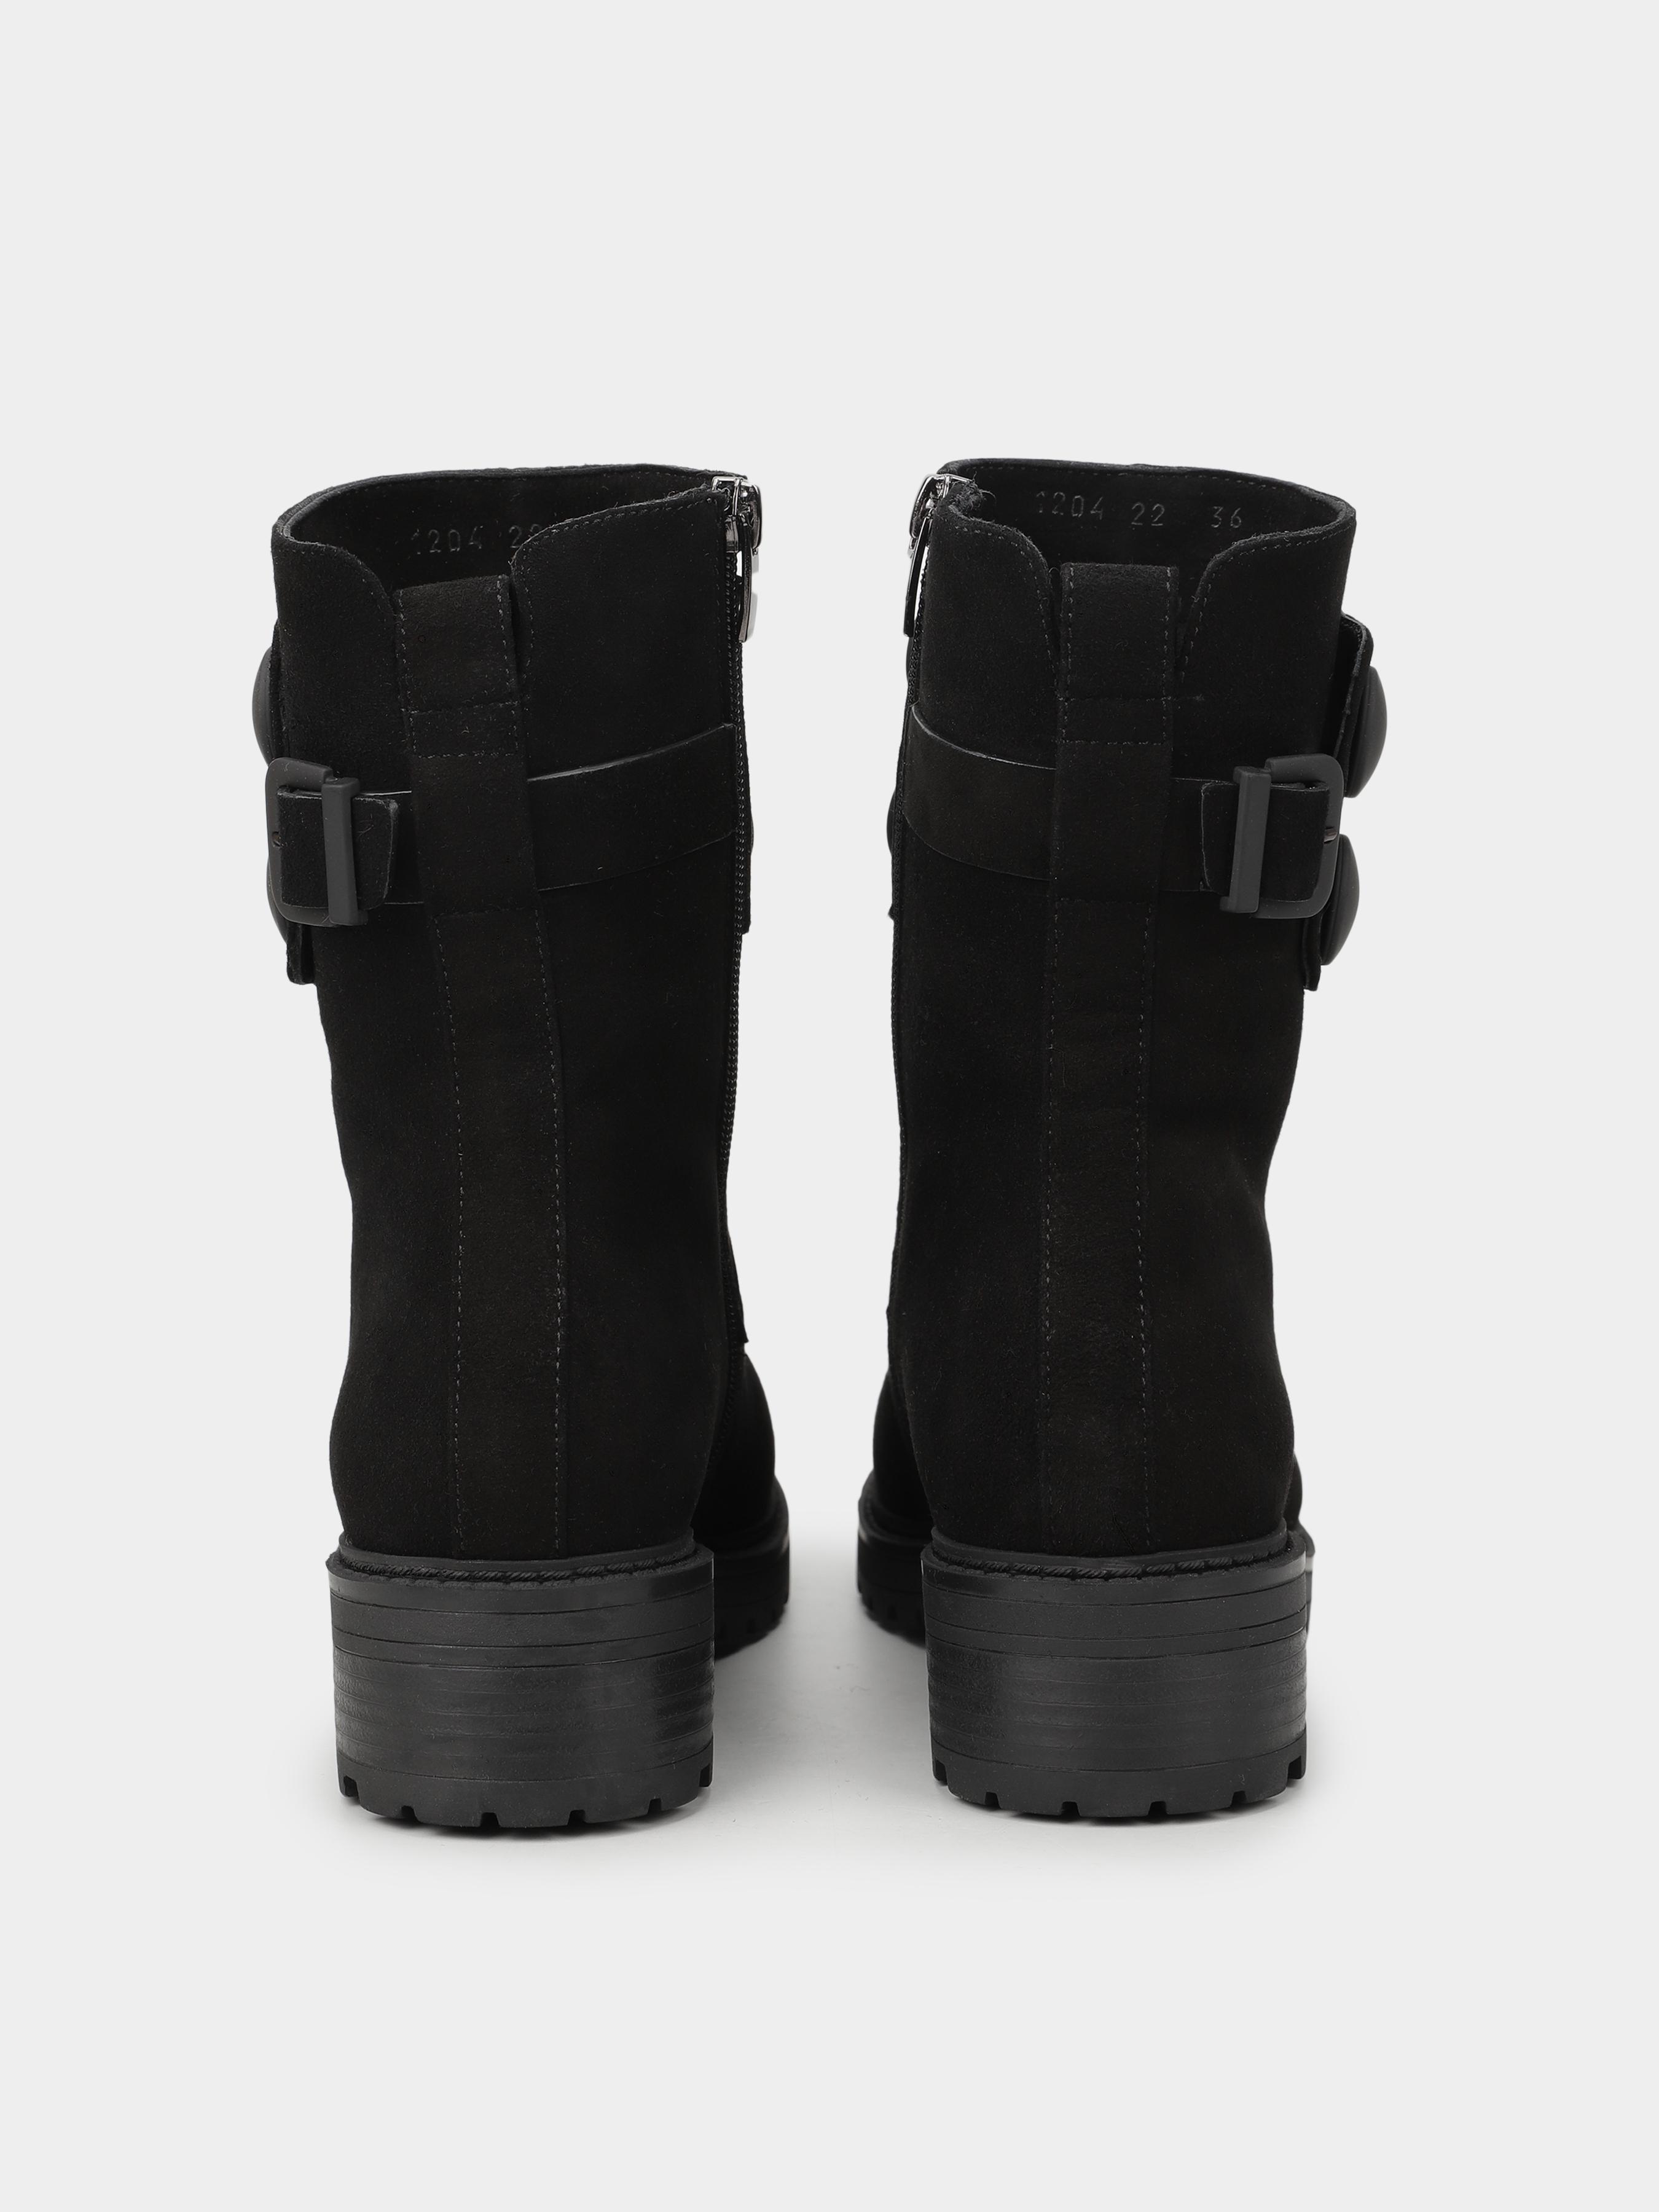 Ботинки для женщин Viko 9W43 брендовые, 2017